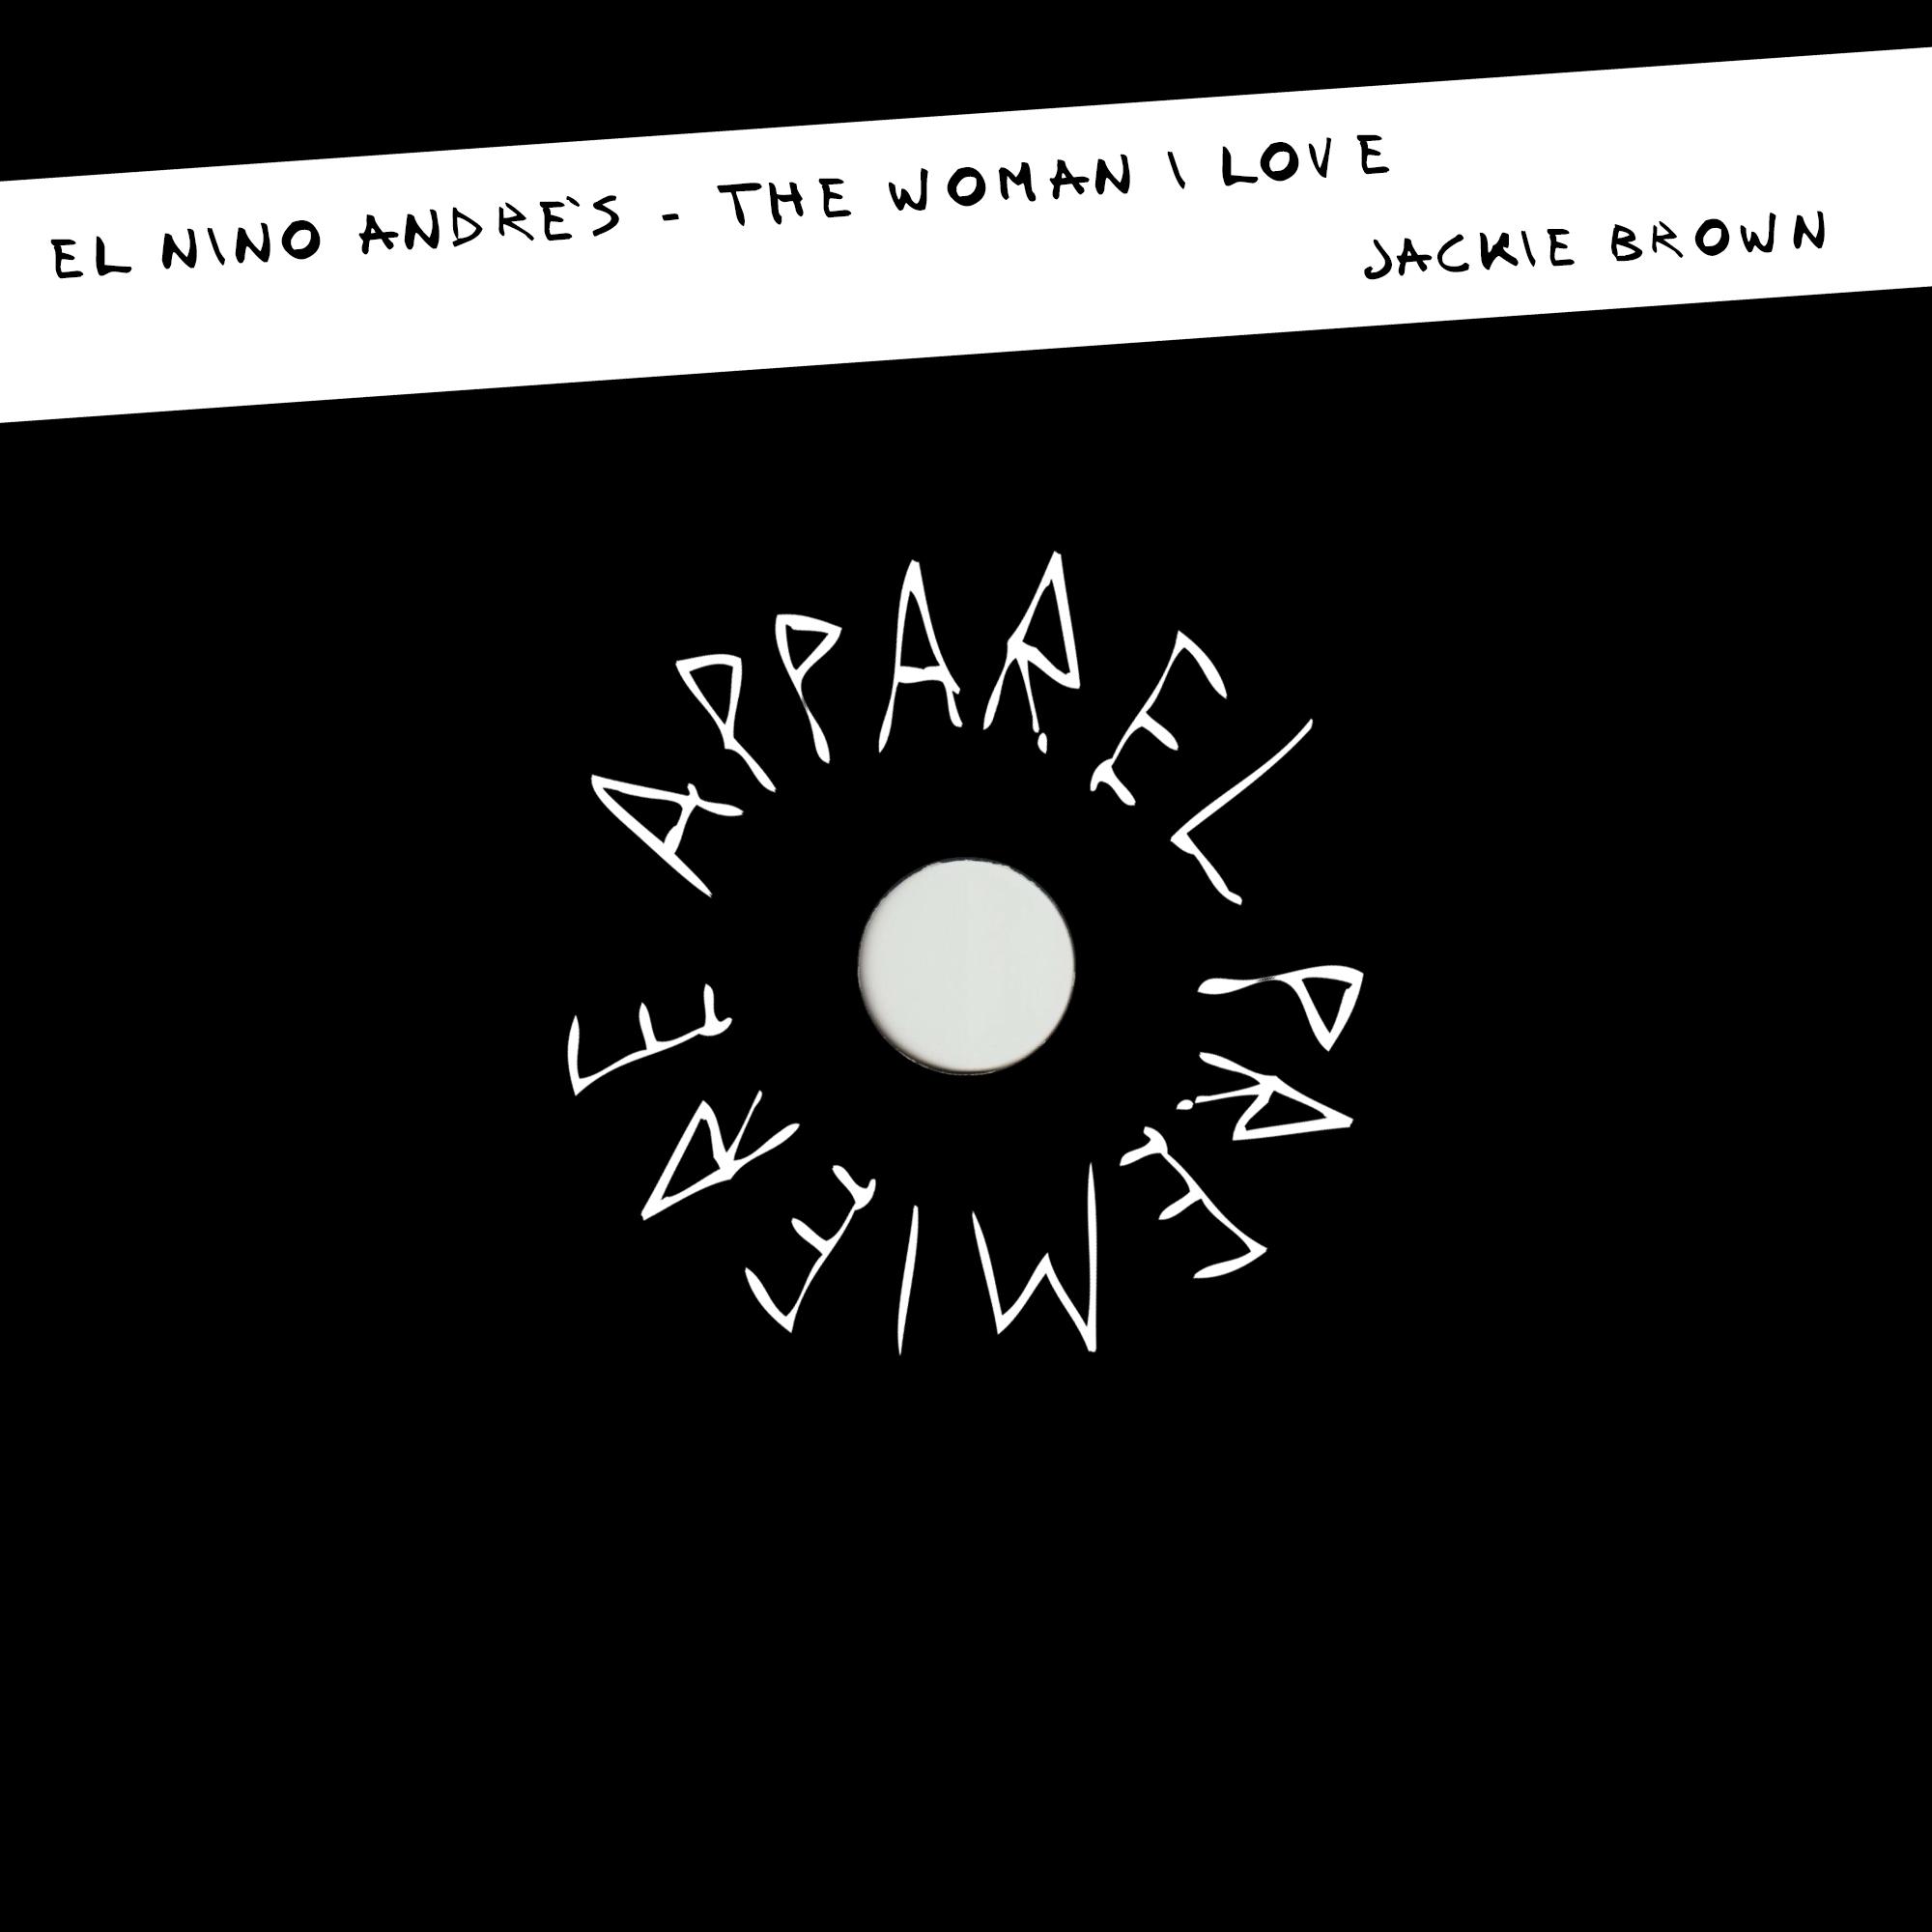 APPAREL PREMIERE El Niño Andrés – The Woman I Love [Jackie Brown]